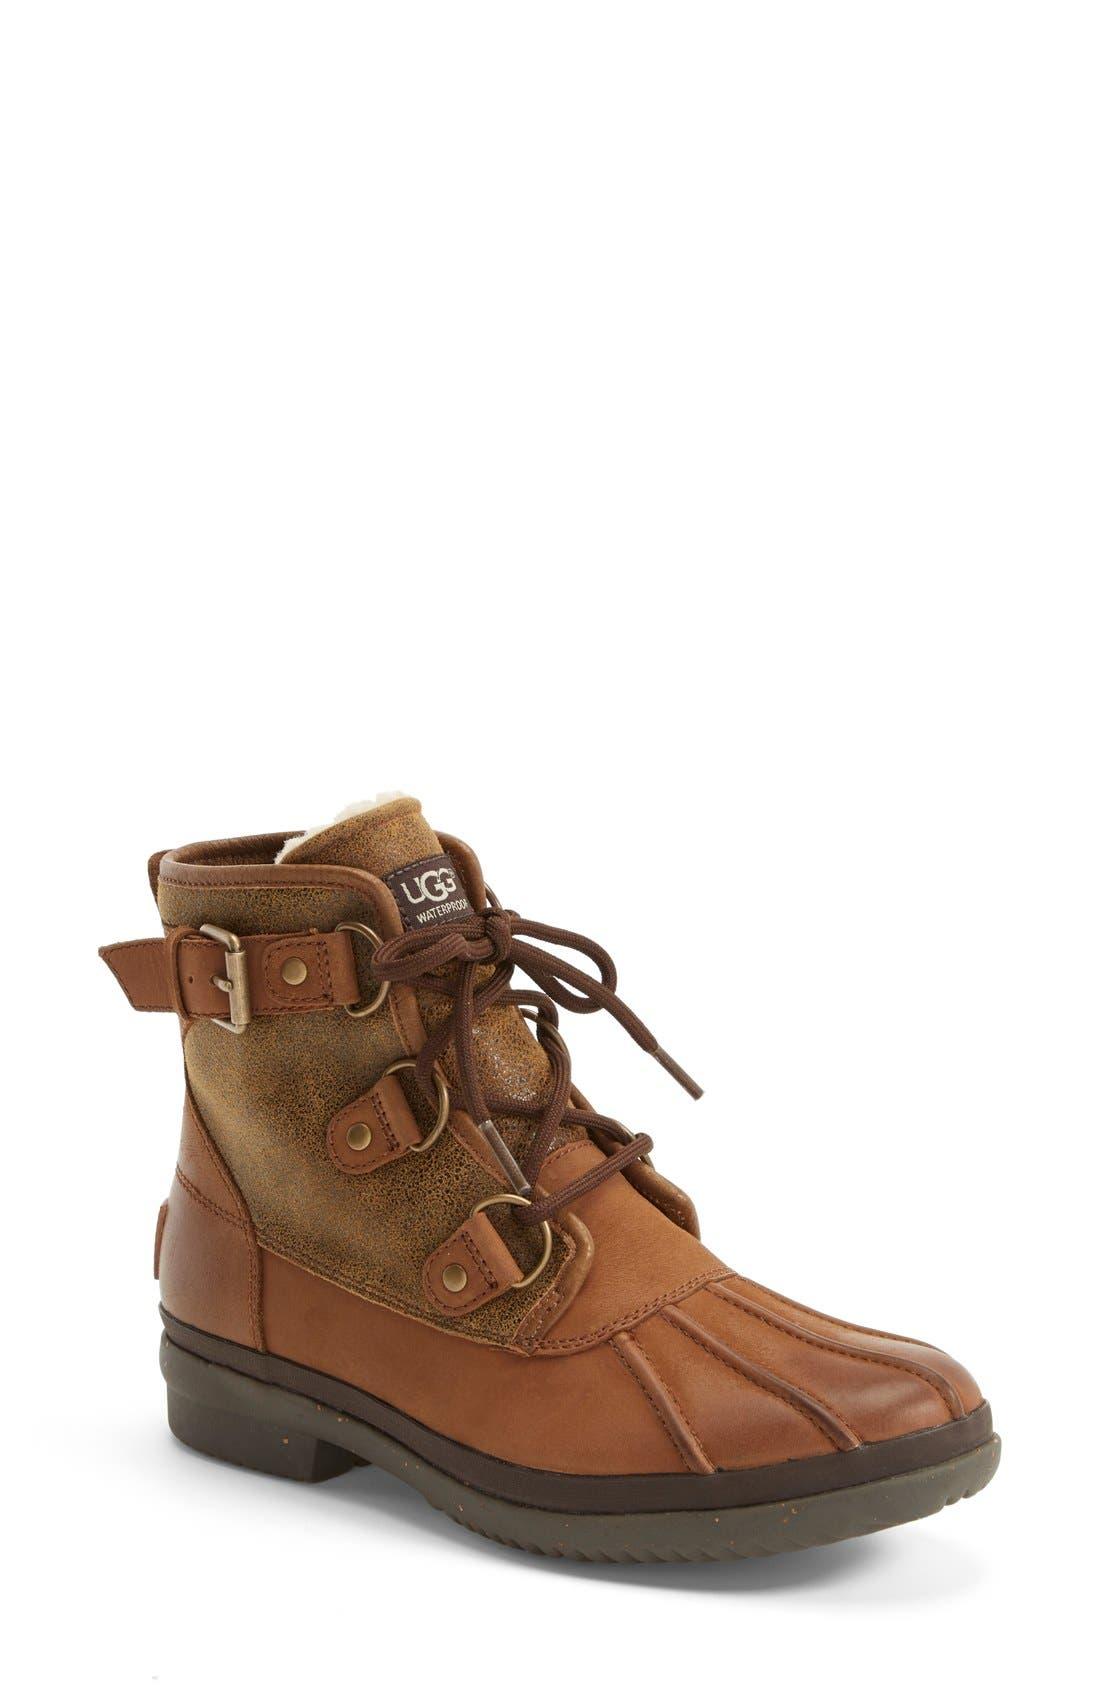 Alternate Image 1 Selected - UGG® Cecile Waterproof Boot (Women)